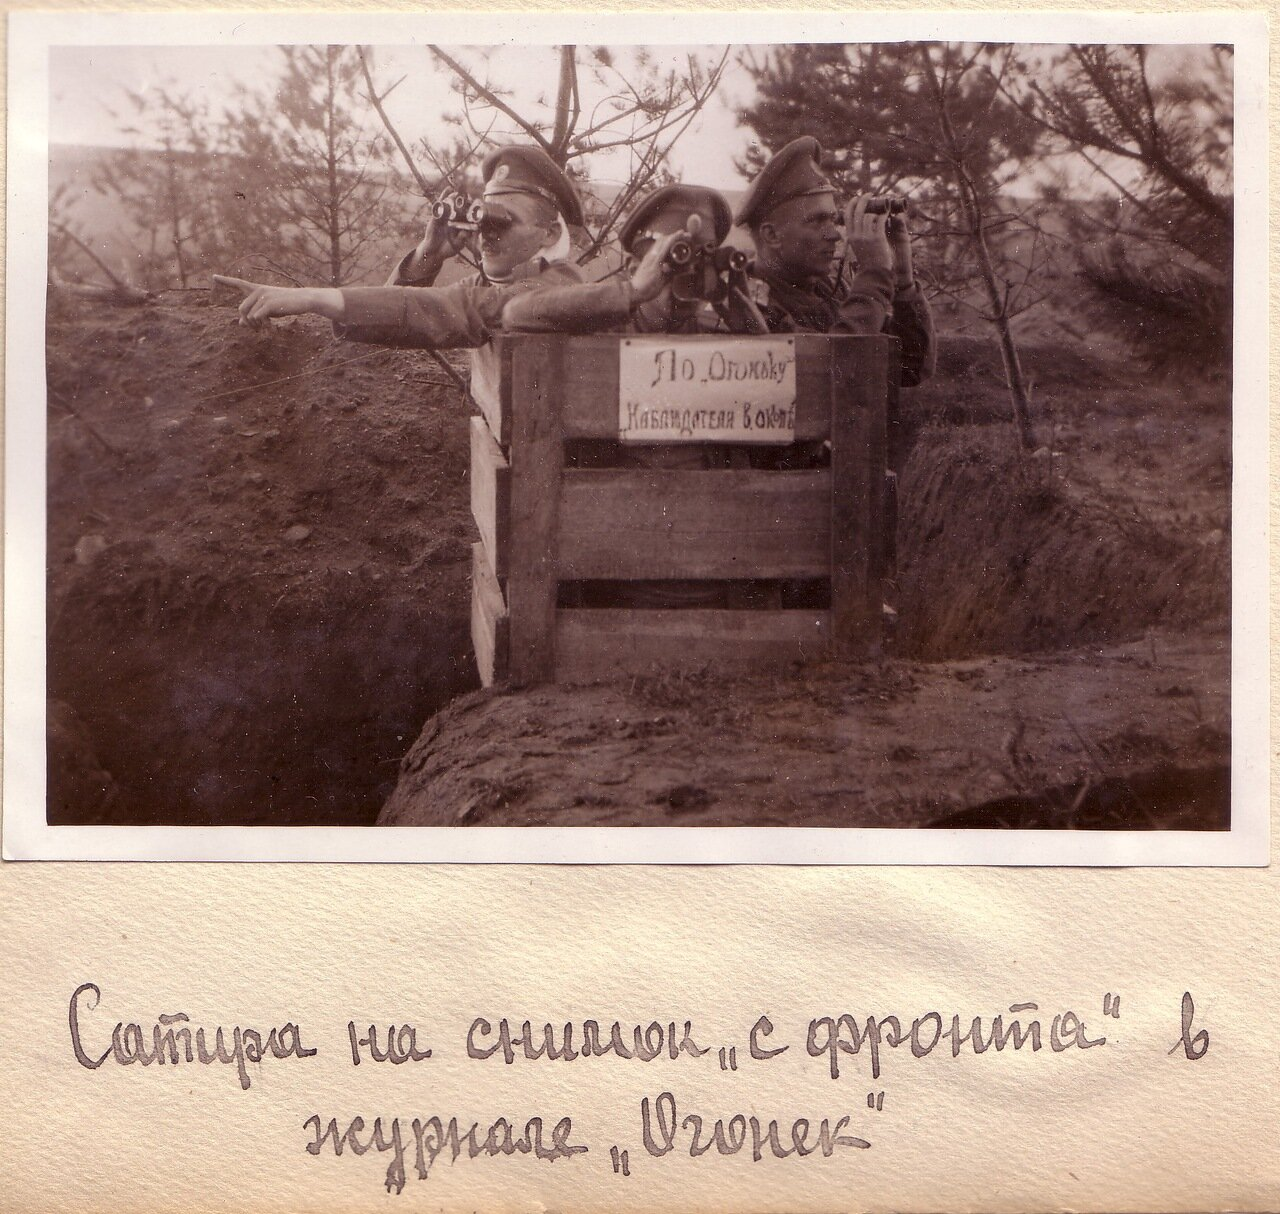 Сатира на снимок «с фронта» в журнале «Огонек»